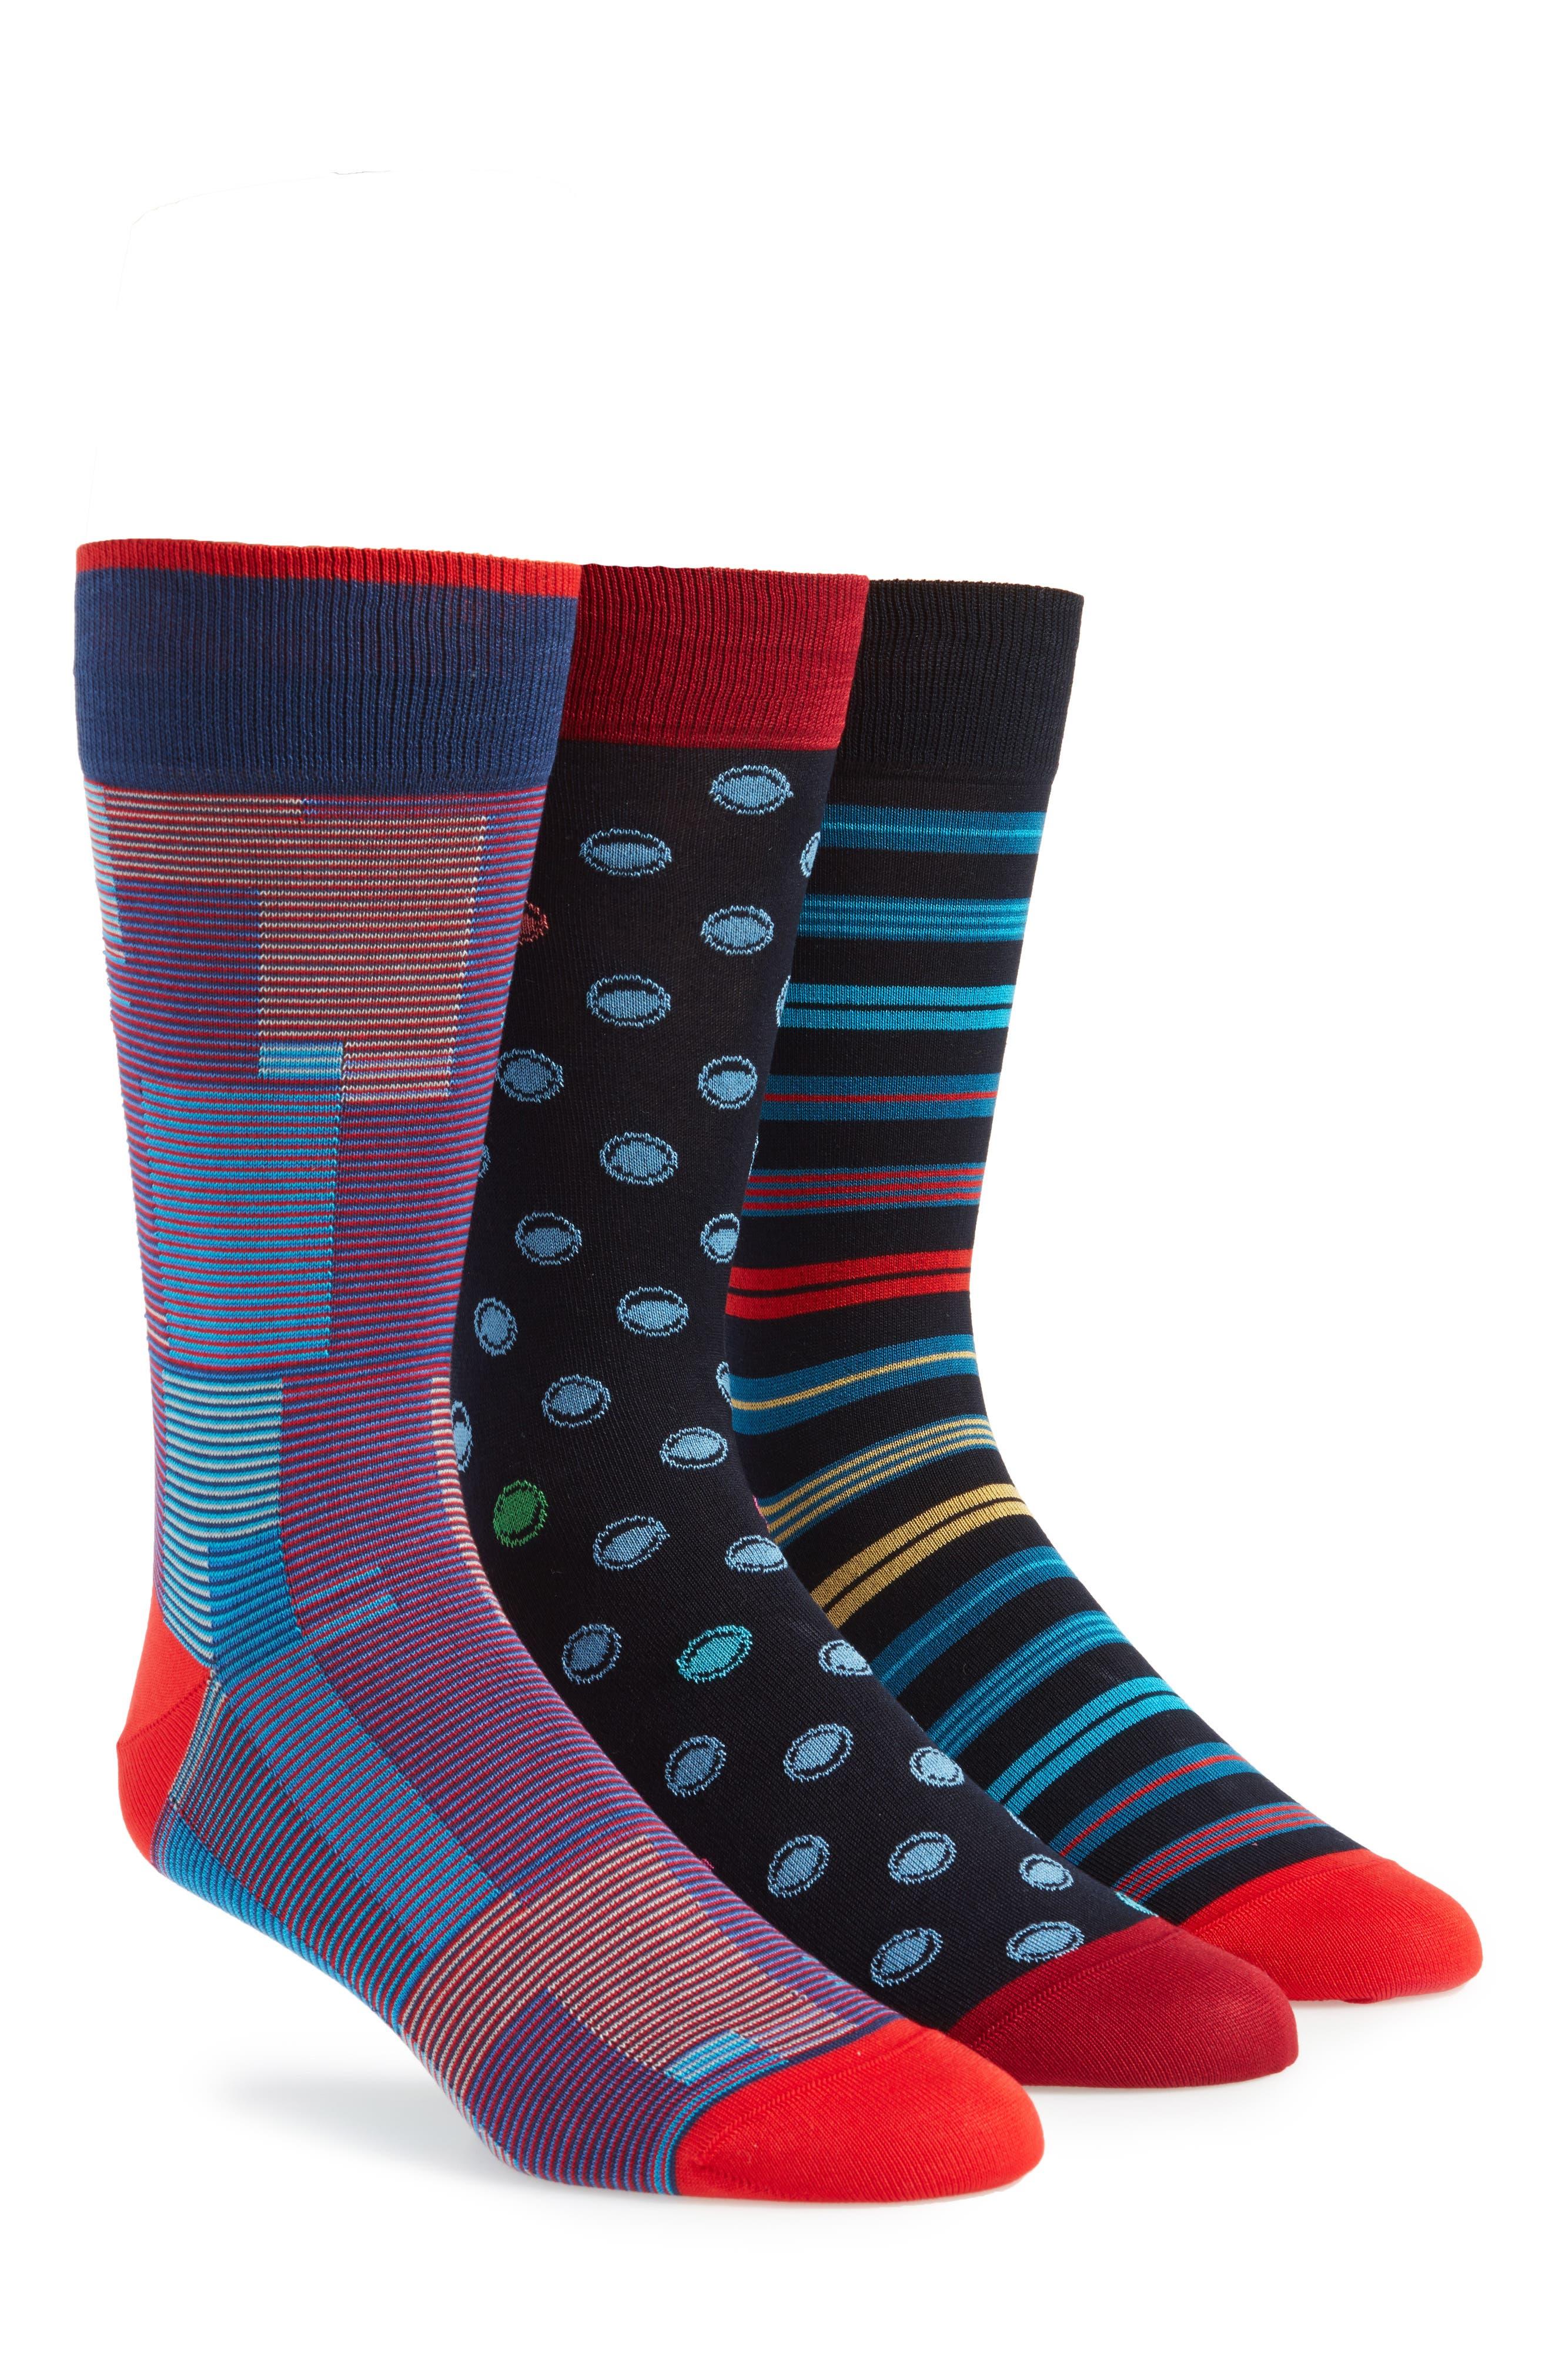 3-Pack Assorted Mercerized Cotton Blend Sock Gift Set,                             Main thumbnail 1, color,                             410